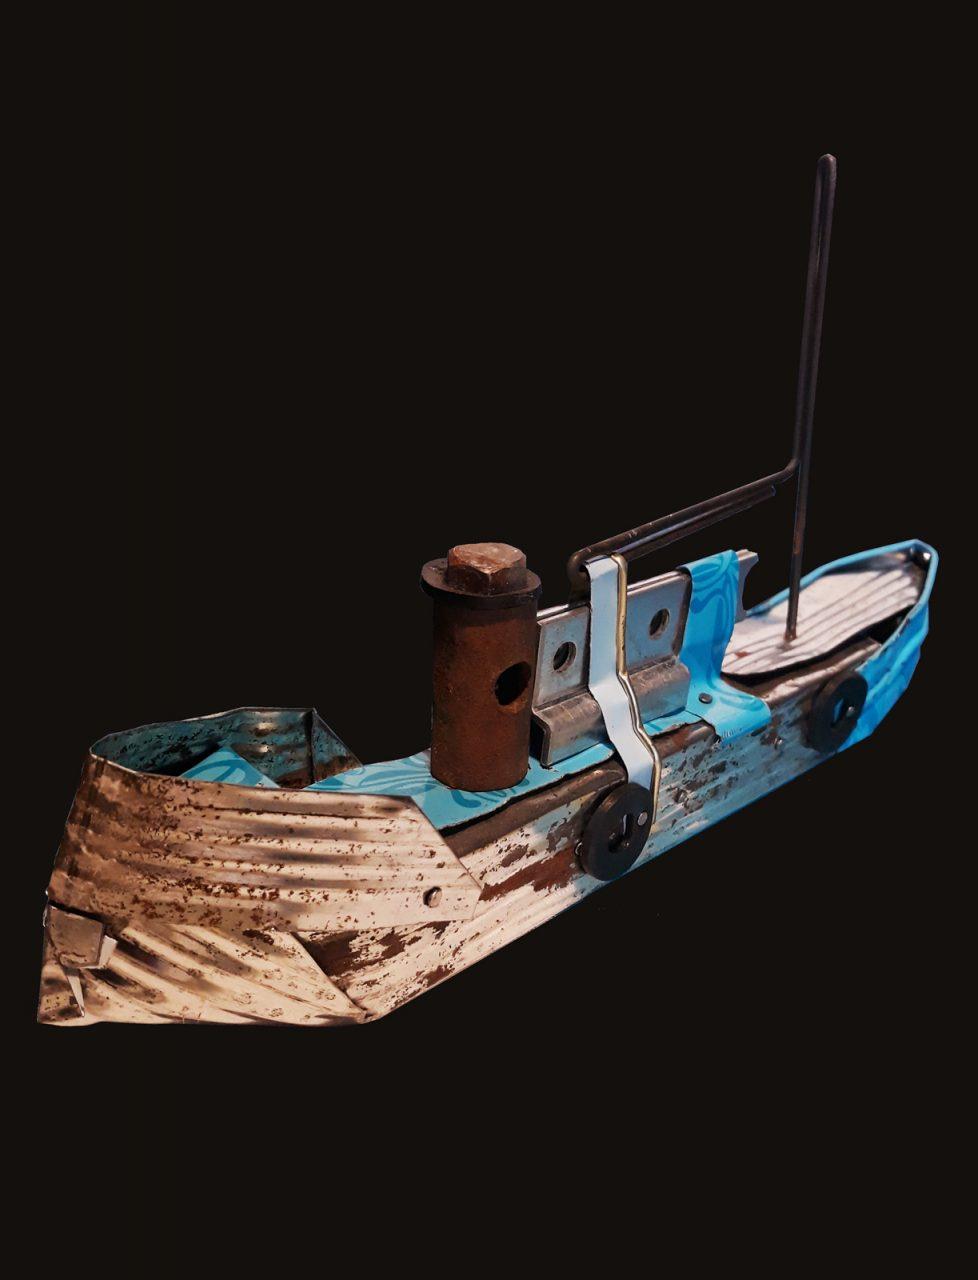 Tin-Can-Fishing-Boat-(-25cm-x-13cm)